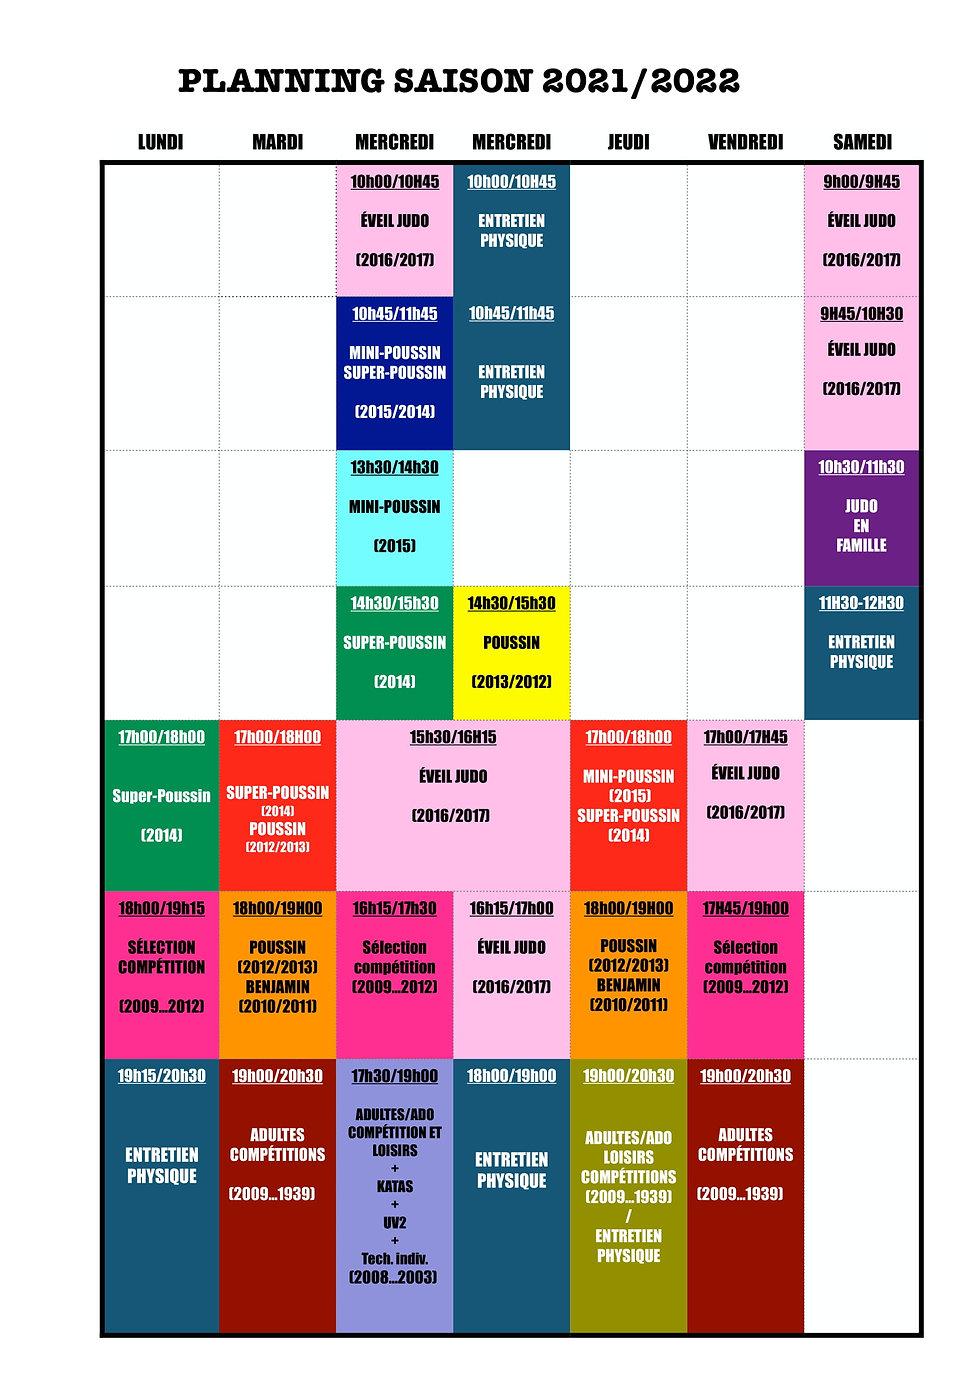 Plannings cours saison 2021 2022(1)-1.jpg